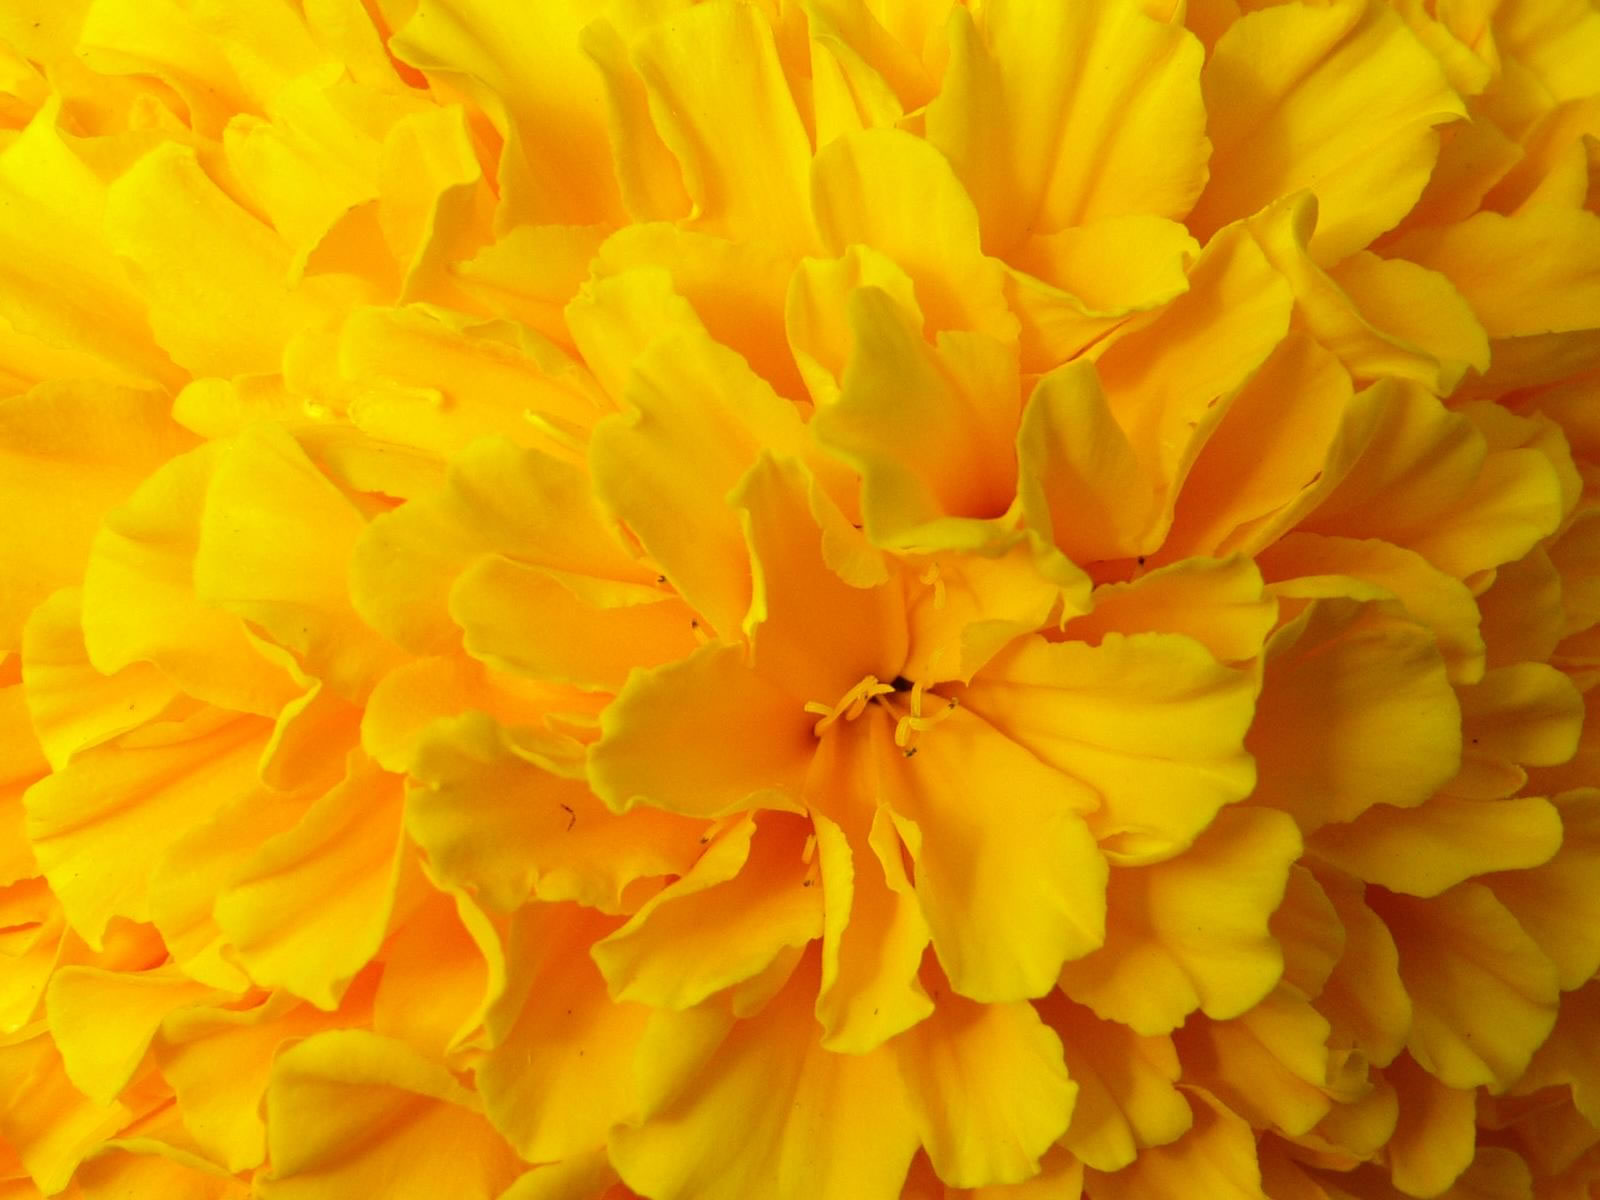 Hd wallpaper yellow flowers - Yellow Flower Wallpaper 1094